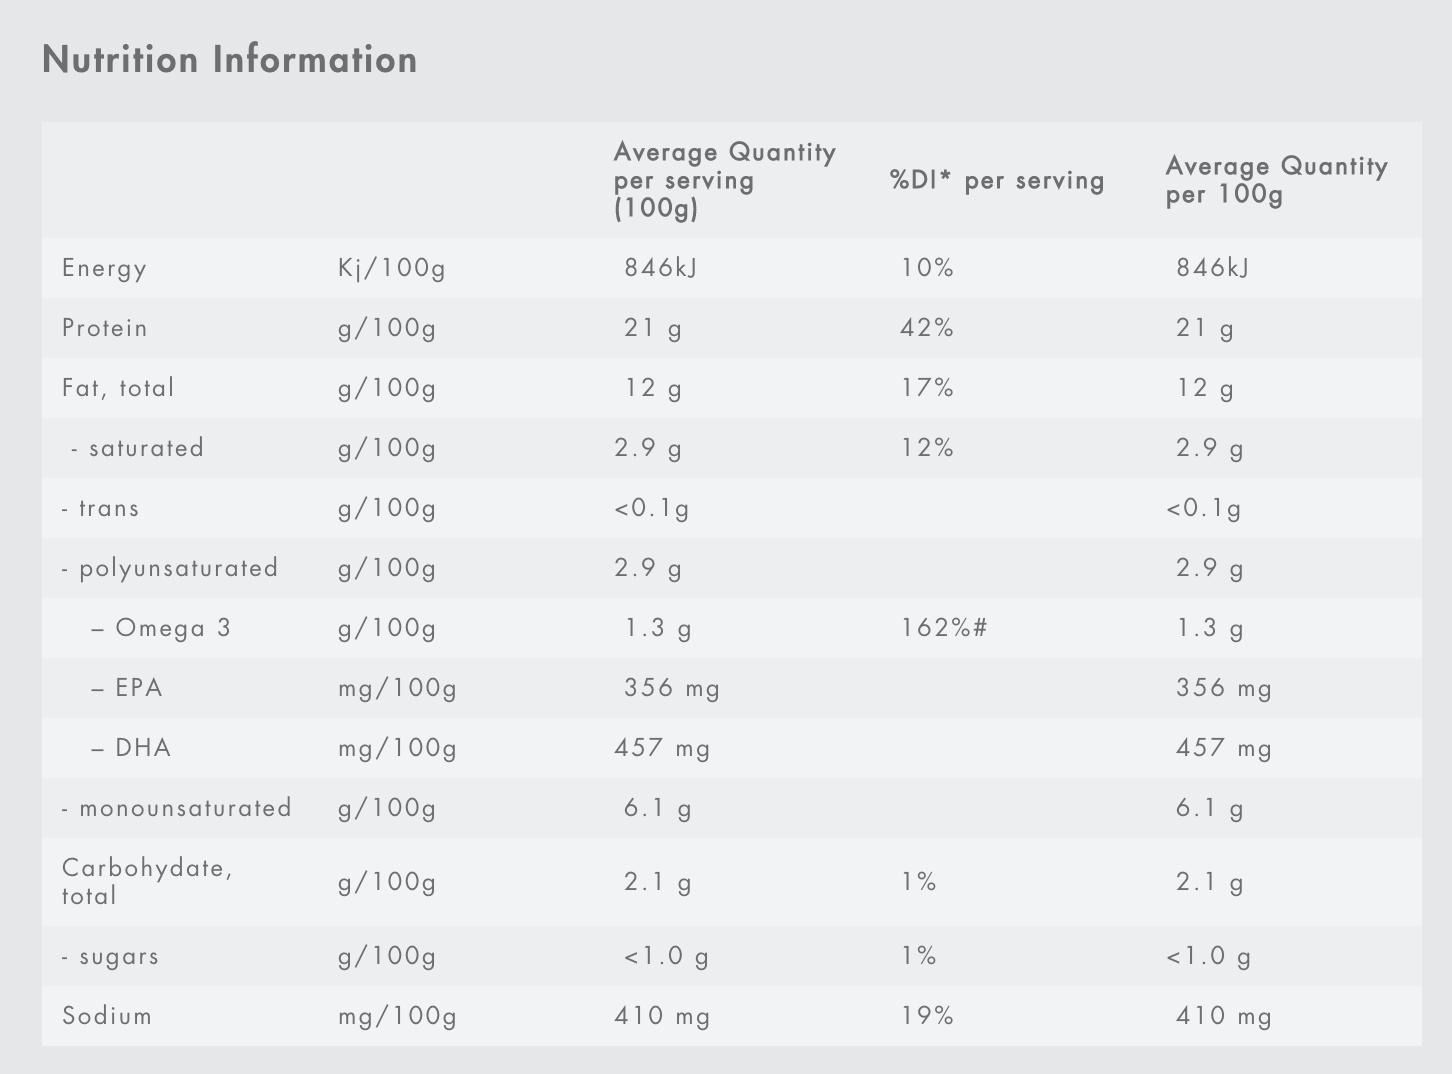 Nutrition Information for Tassal Salmon burgers